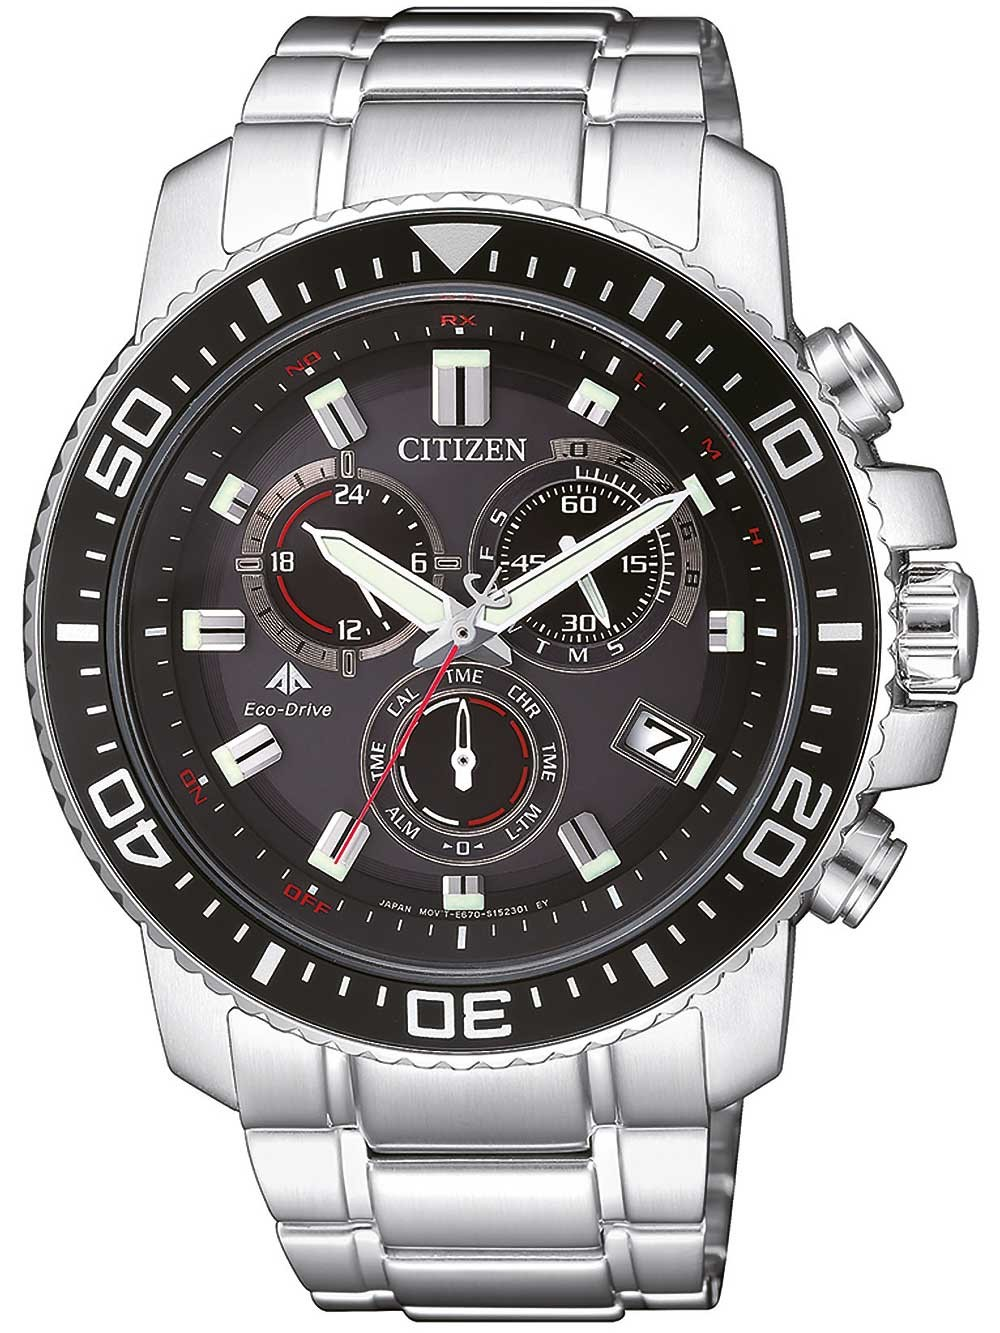 Watches Chrono12 Citizen As4080 51e Eco Drive Funkuhr